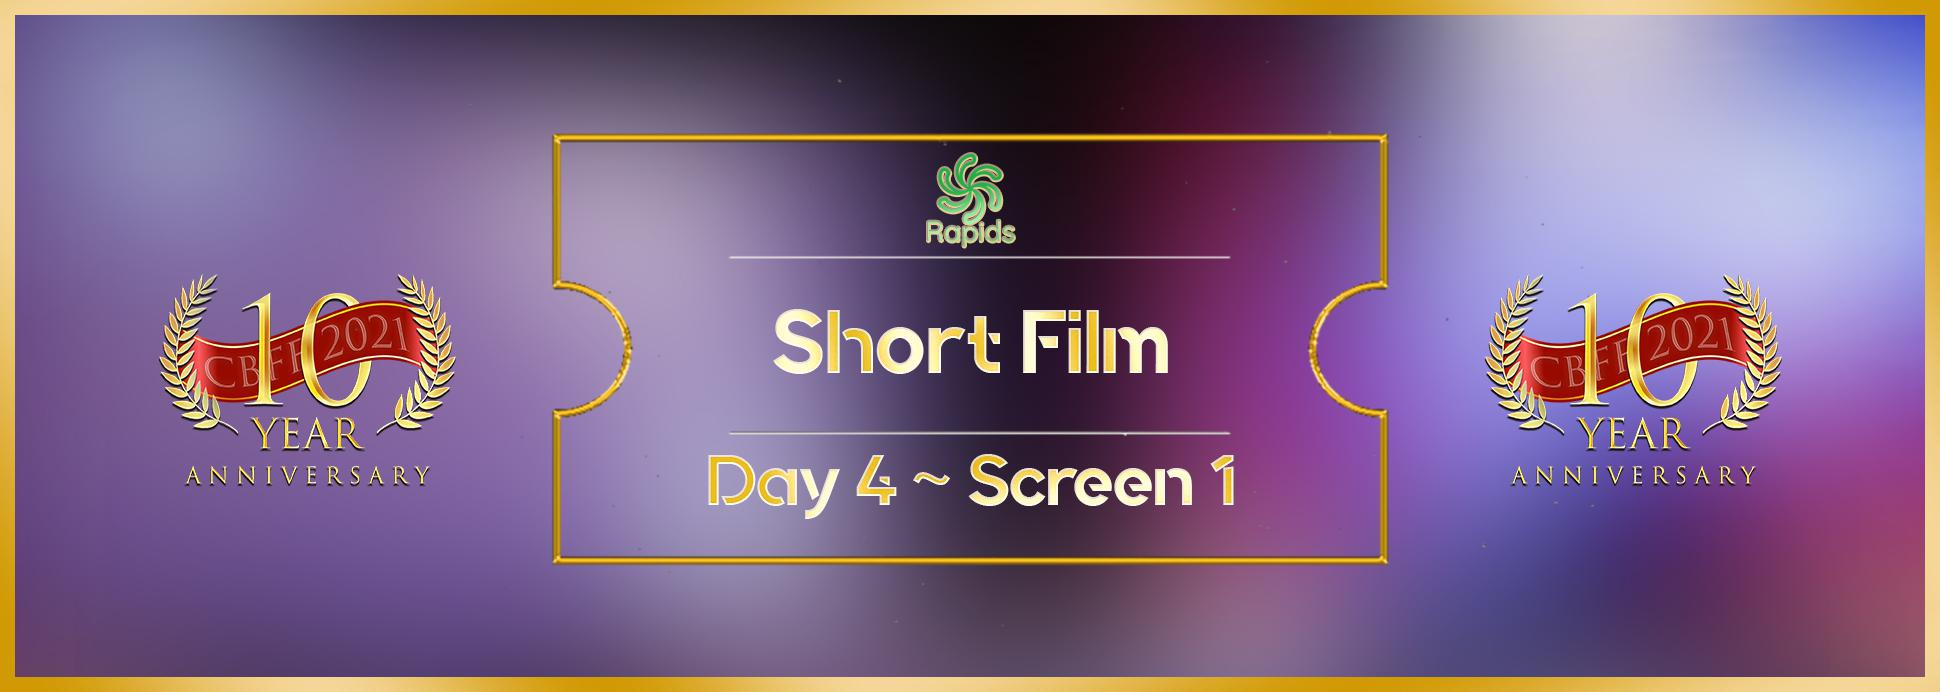 Day 4, Screen 1: Short Film